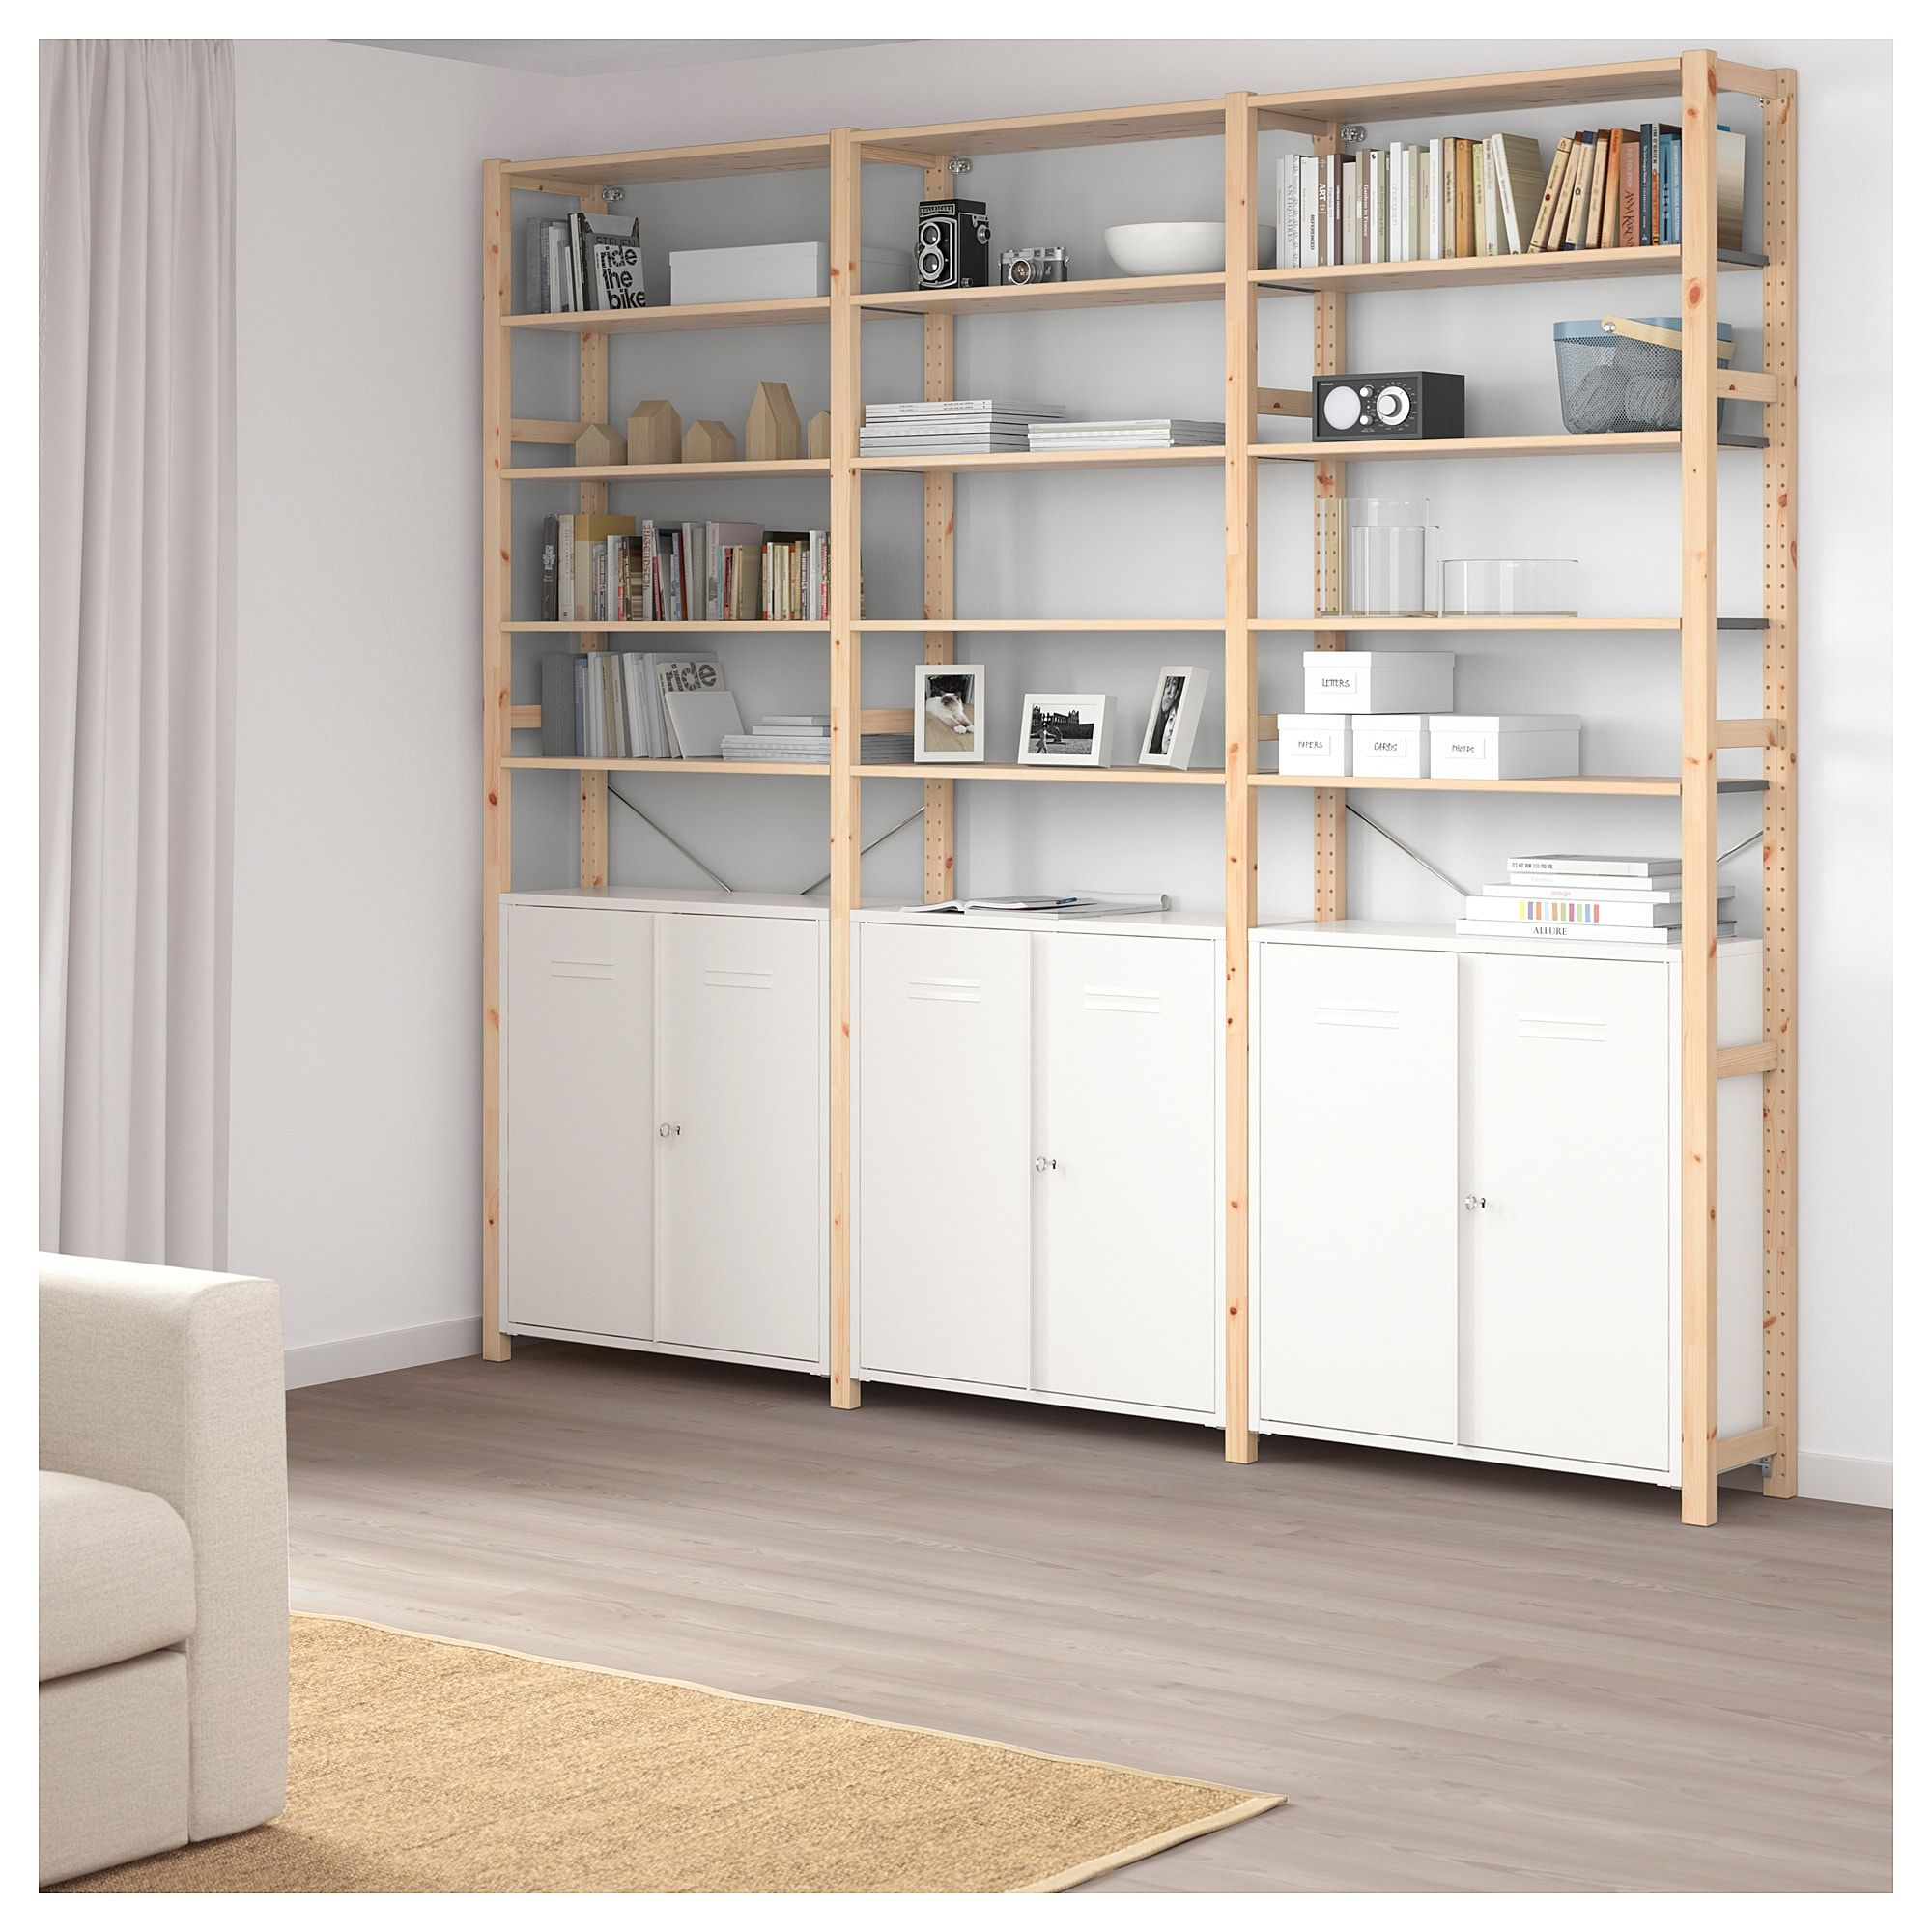 IKEA IVAR White with doors Shelves, Ikea, Wall